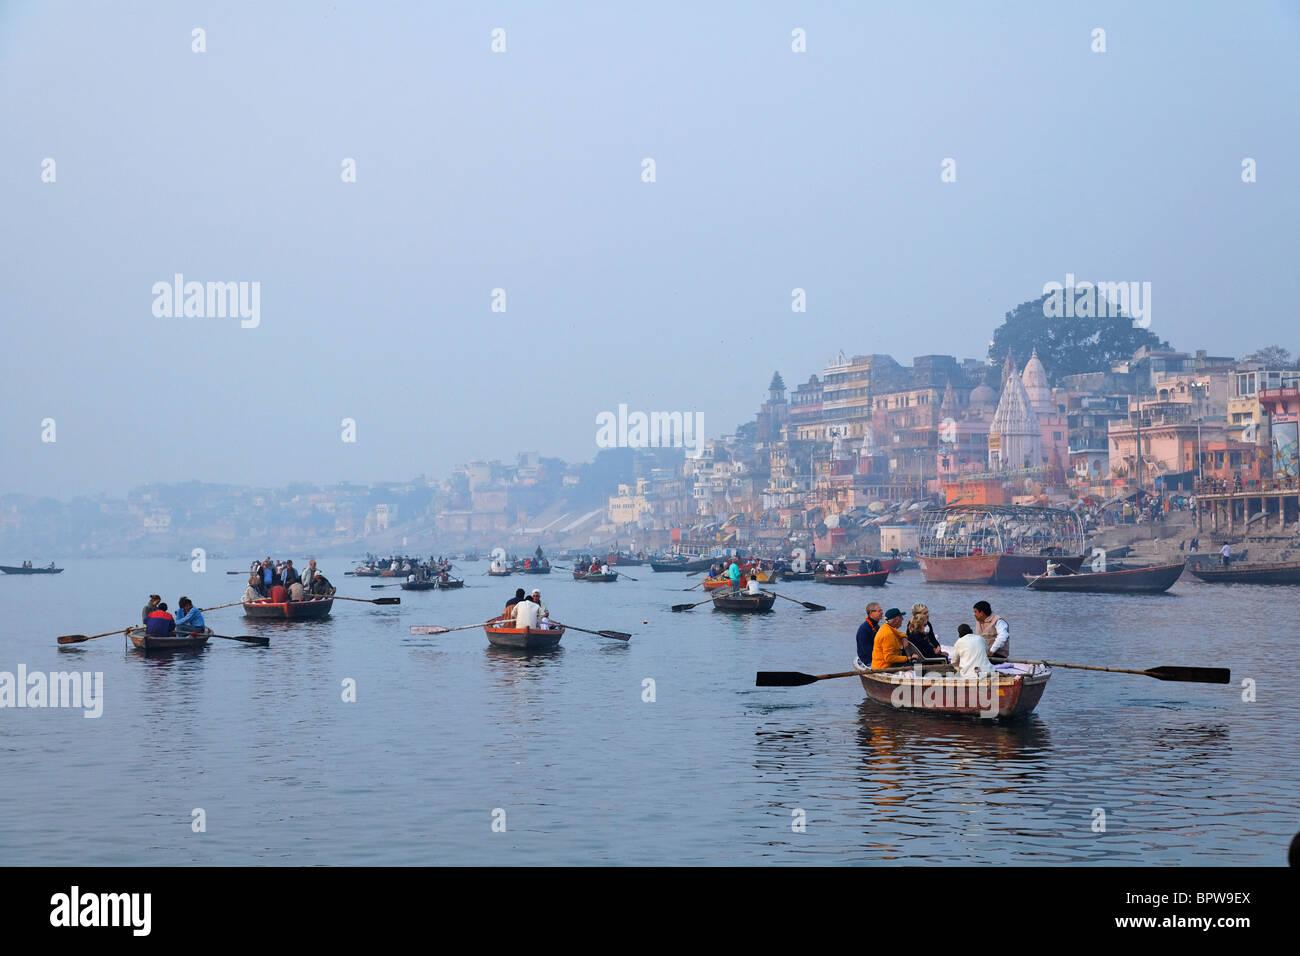 Bateaux de touristes, Gange, Varanasi, Inde Photo Stock